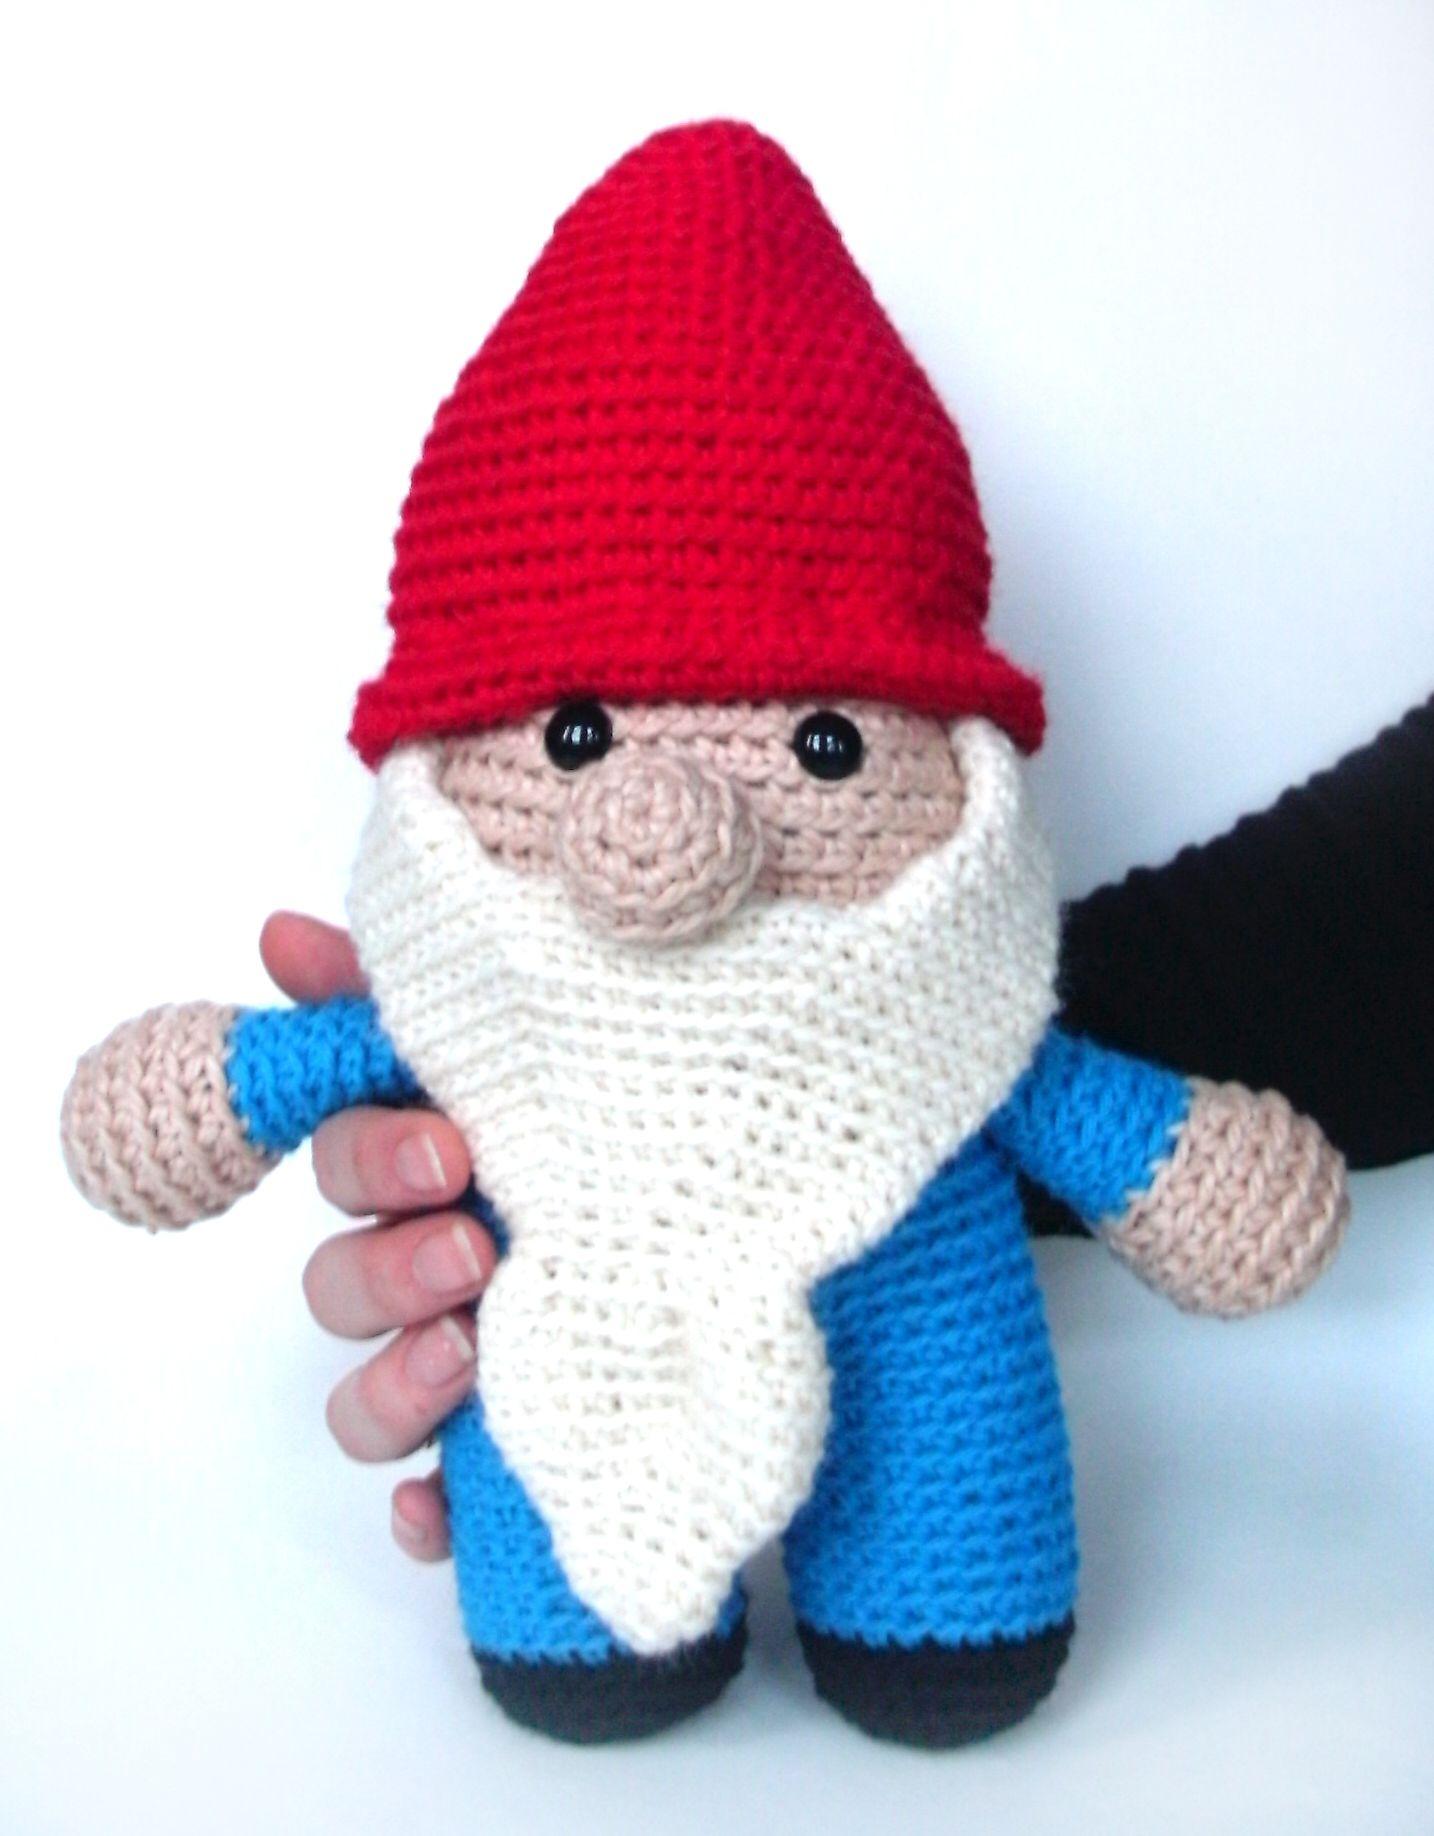 Amigurumi Hello Kitty Free Pattern : crochet gnome stuffed animal pattern Gnome is where the ...